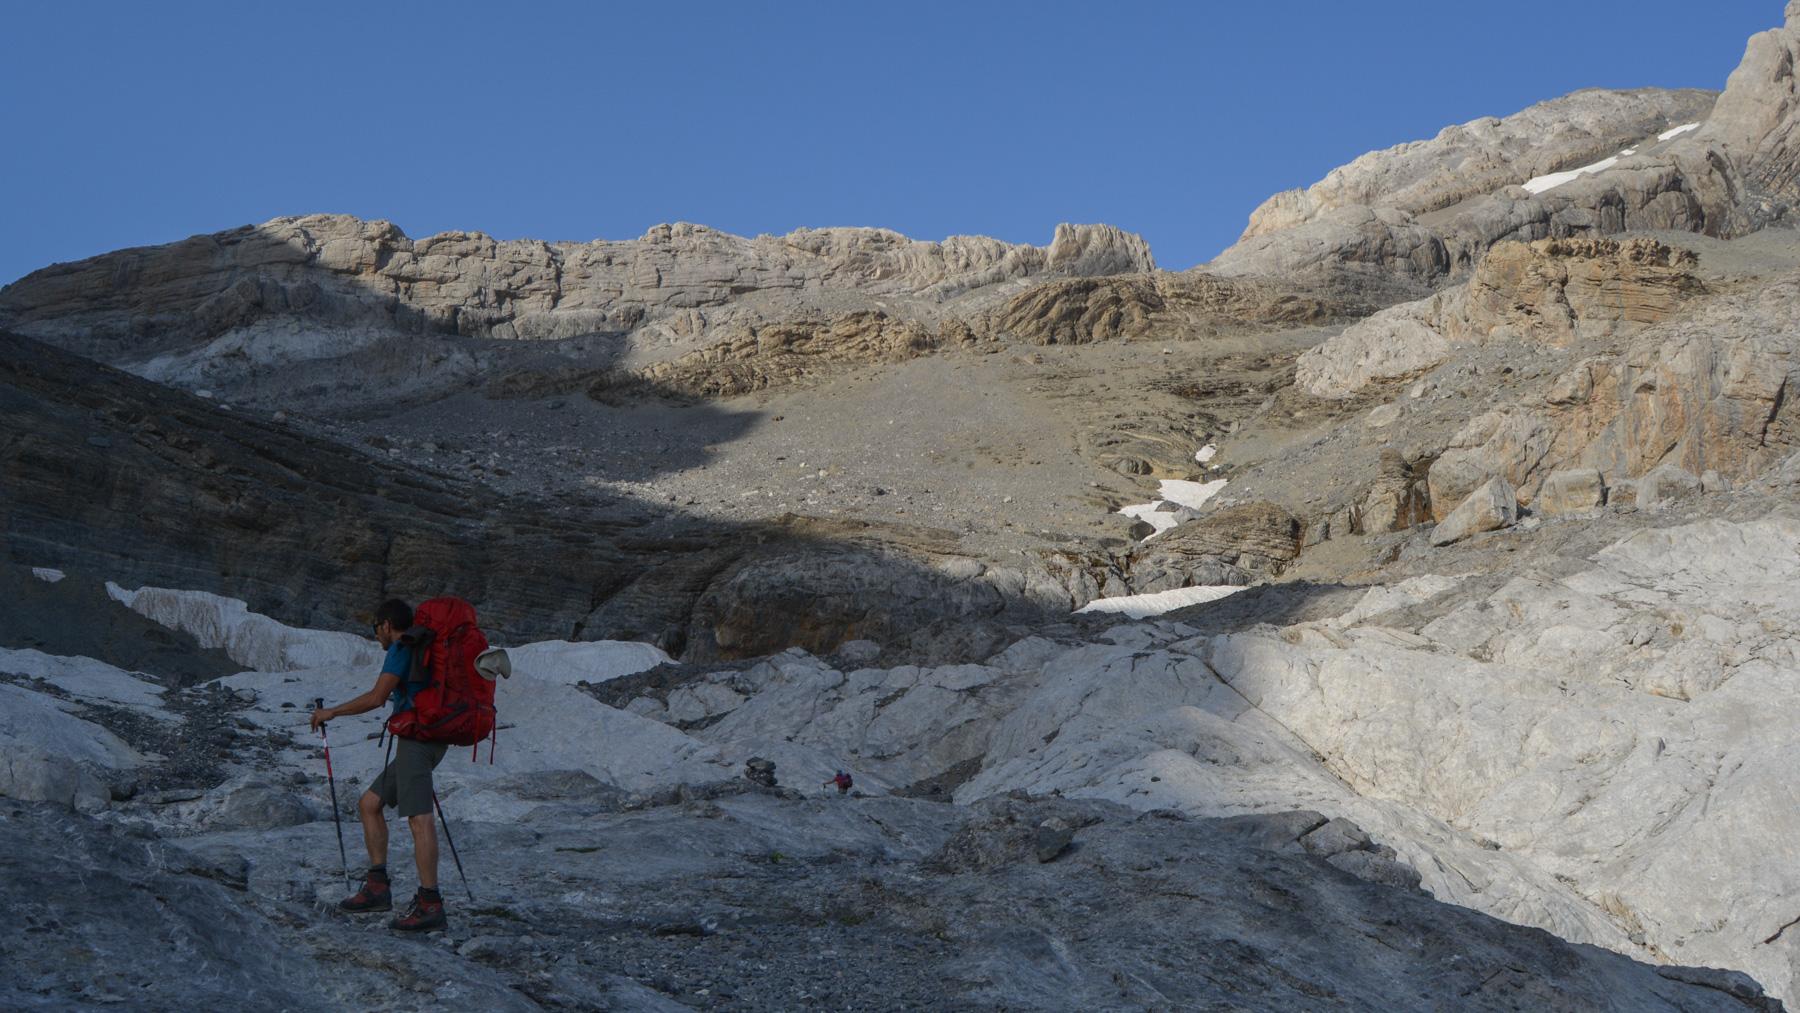 Monte Perdido et Faja de las Flores, Jour 1, Ordesa, Aragon, Espagne 42